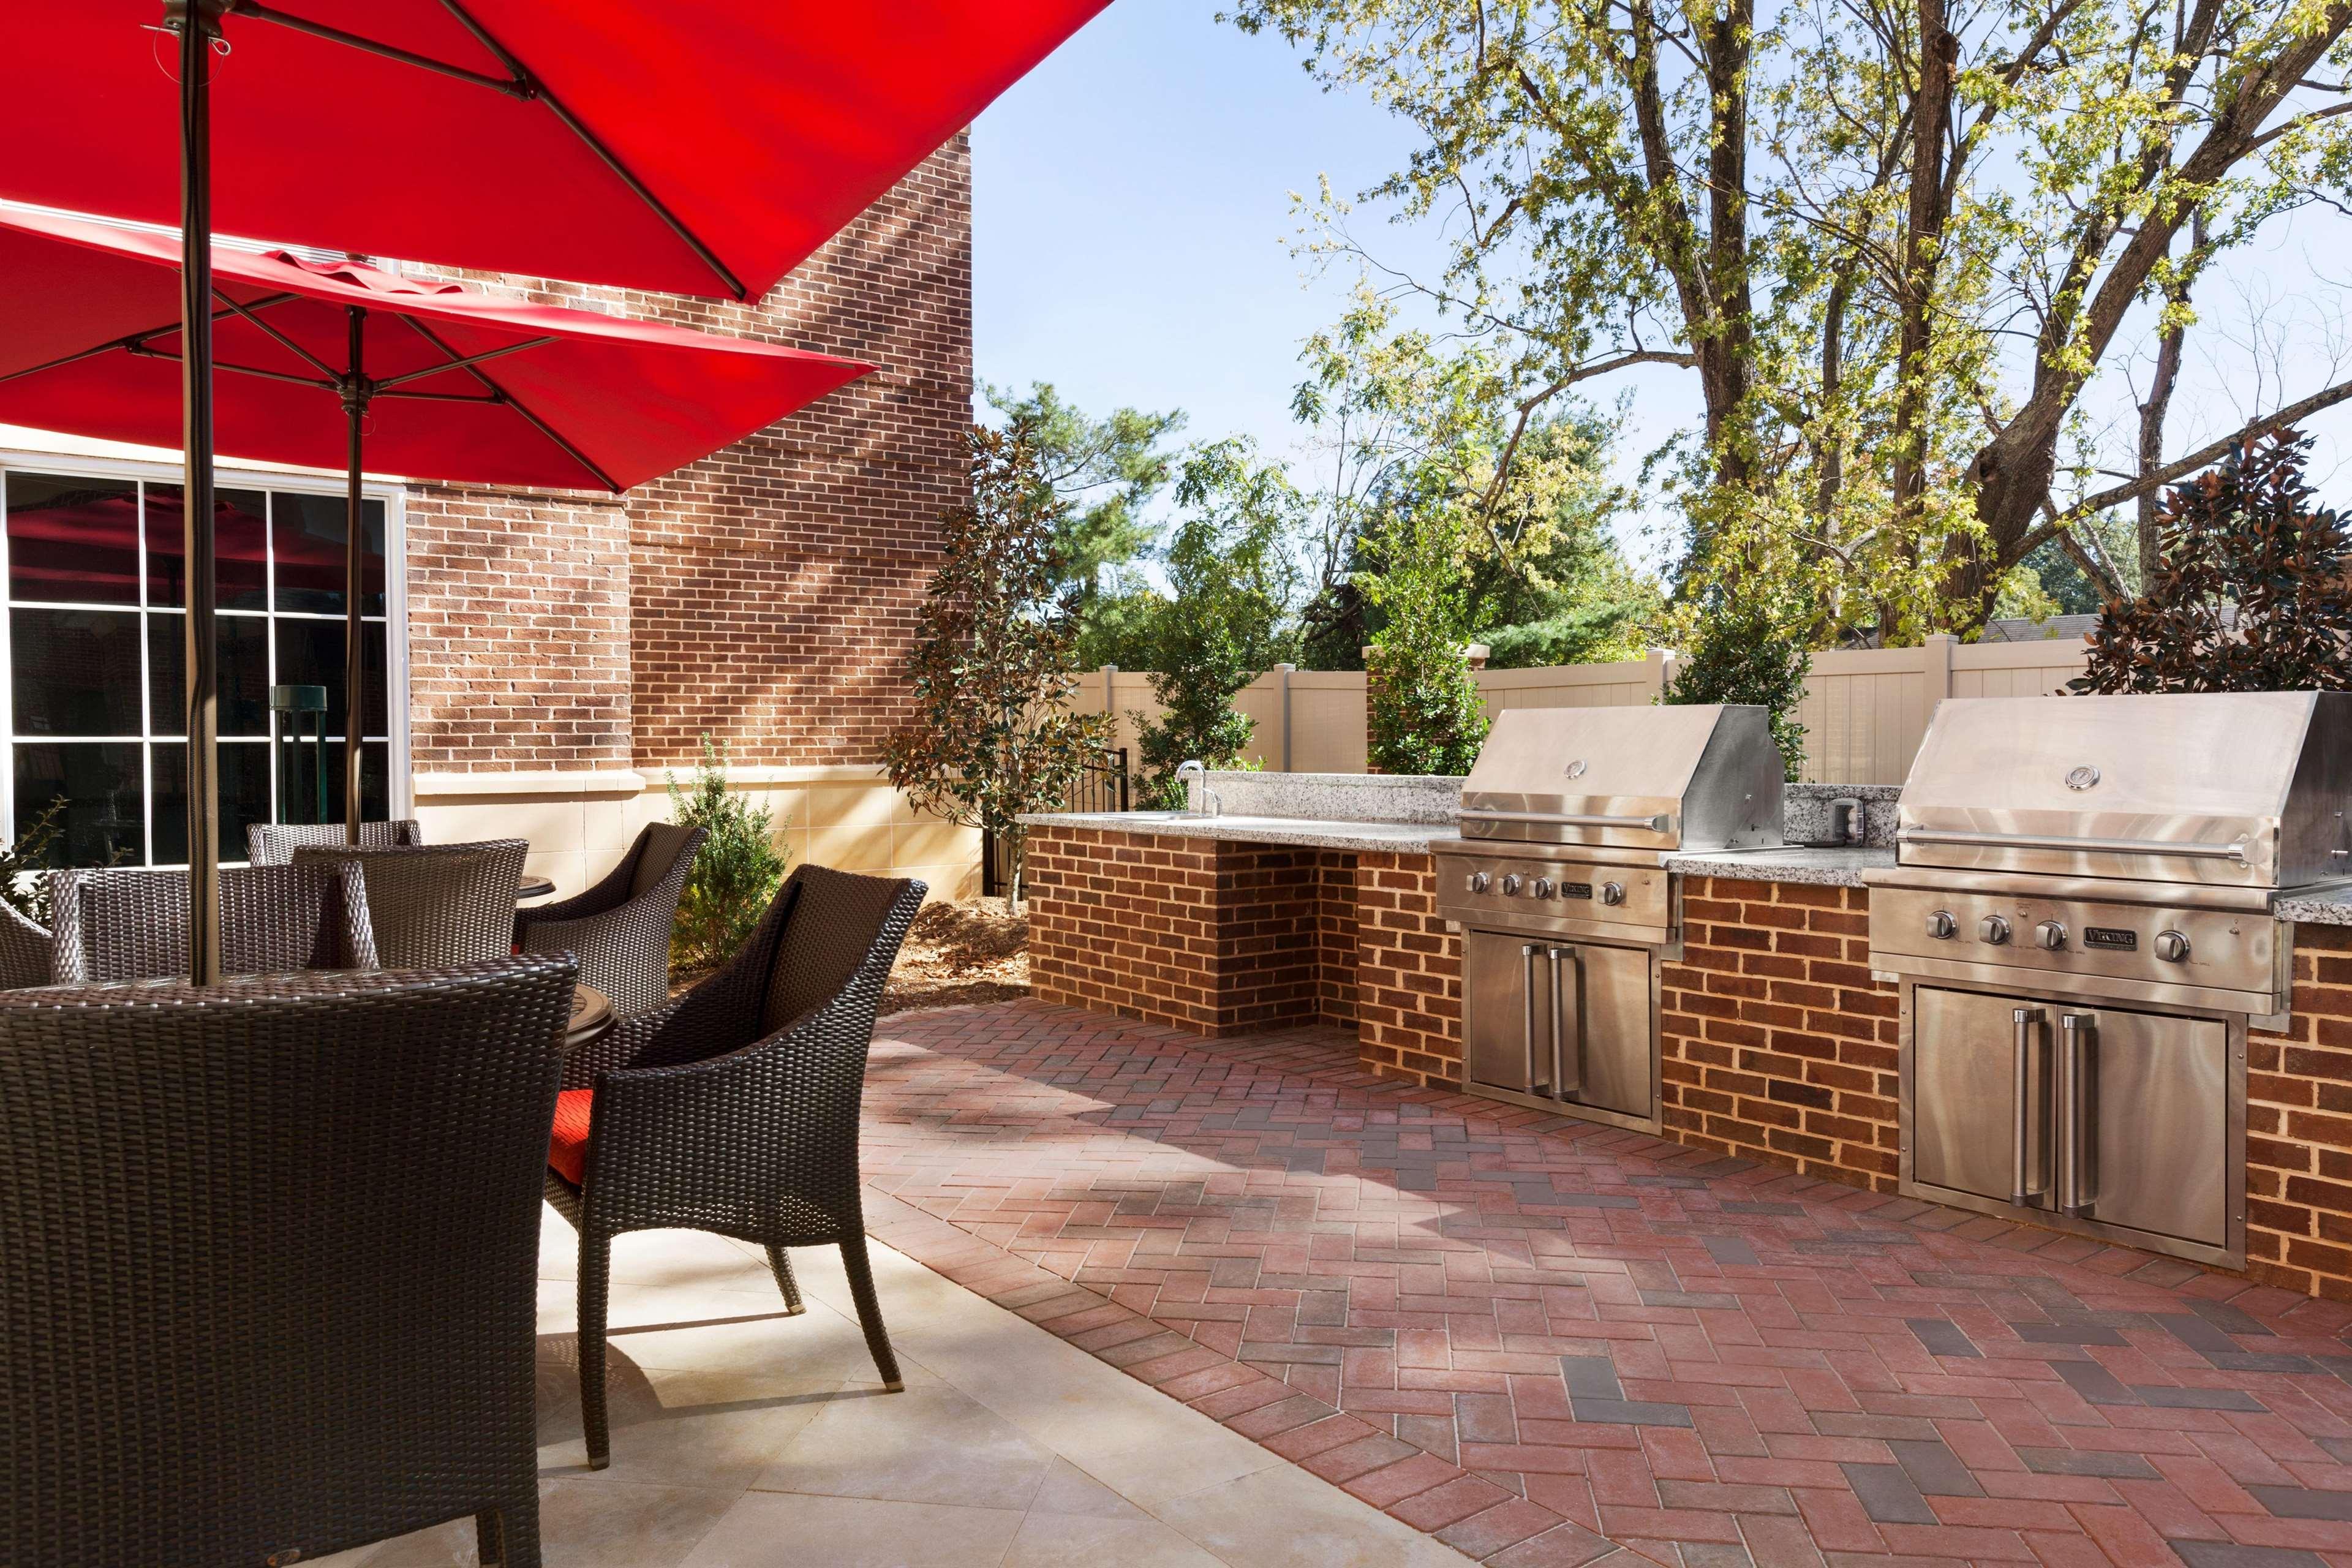 Homewood Suites by Hilton Charlotte/SouthPark image 4